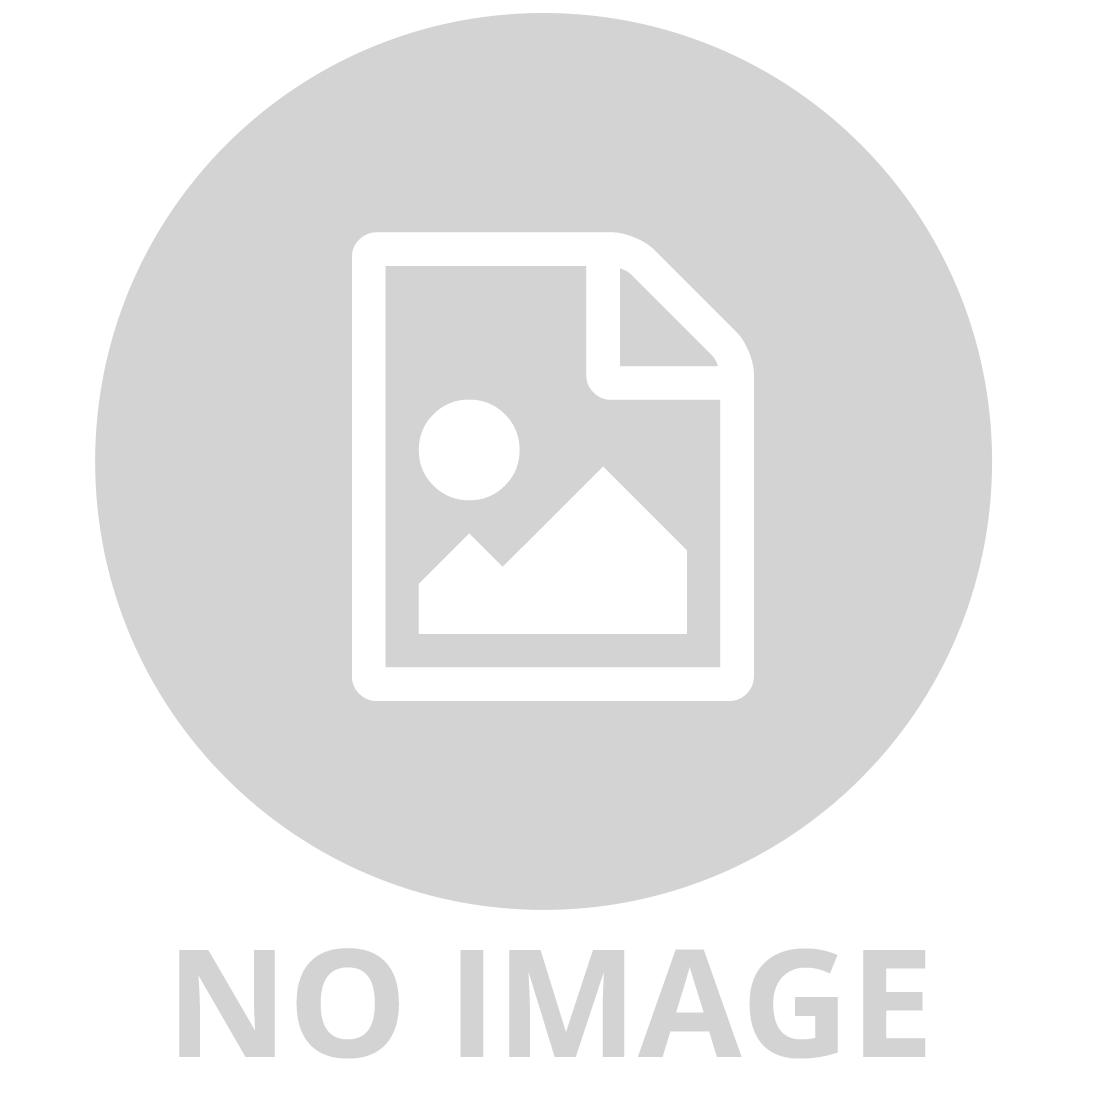 LEGO STAR WARS 75235 TRENCH RUN X-WING STARFIGHTER